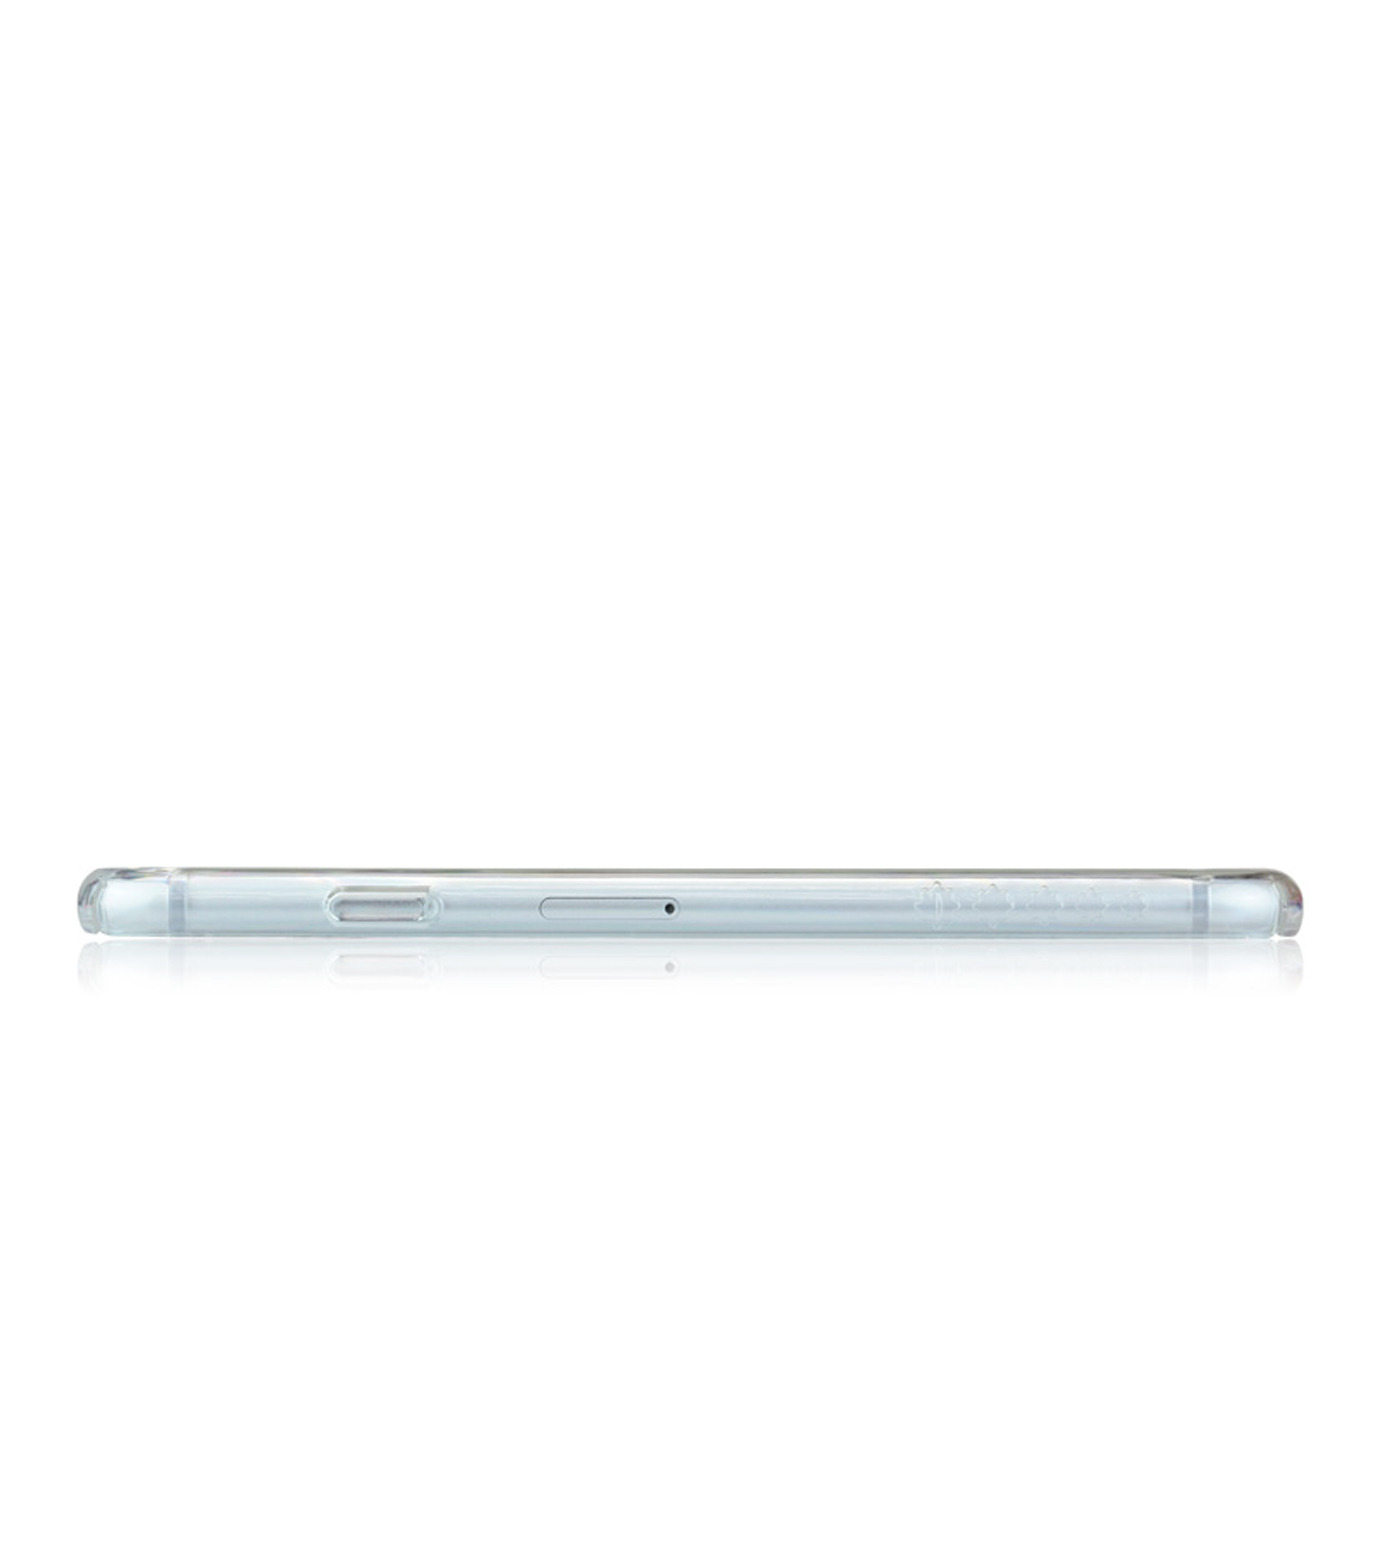 Tunewear(チューンウエア)のEGGSHELL for iPhone6 Plus-WHITE(ケースiphone6plus/6splus/case iphone6plus/6splus)-TUN-PH-0327-4 拡大詳細画像8